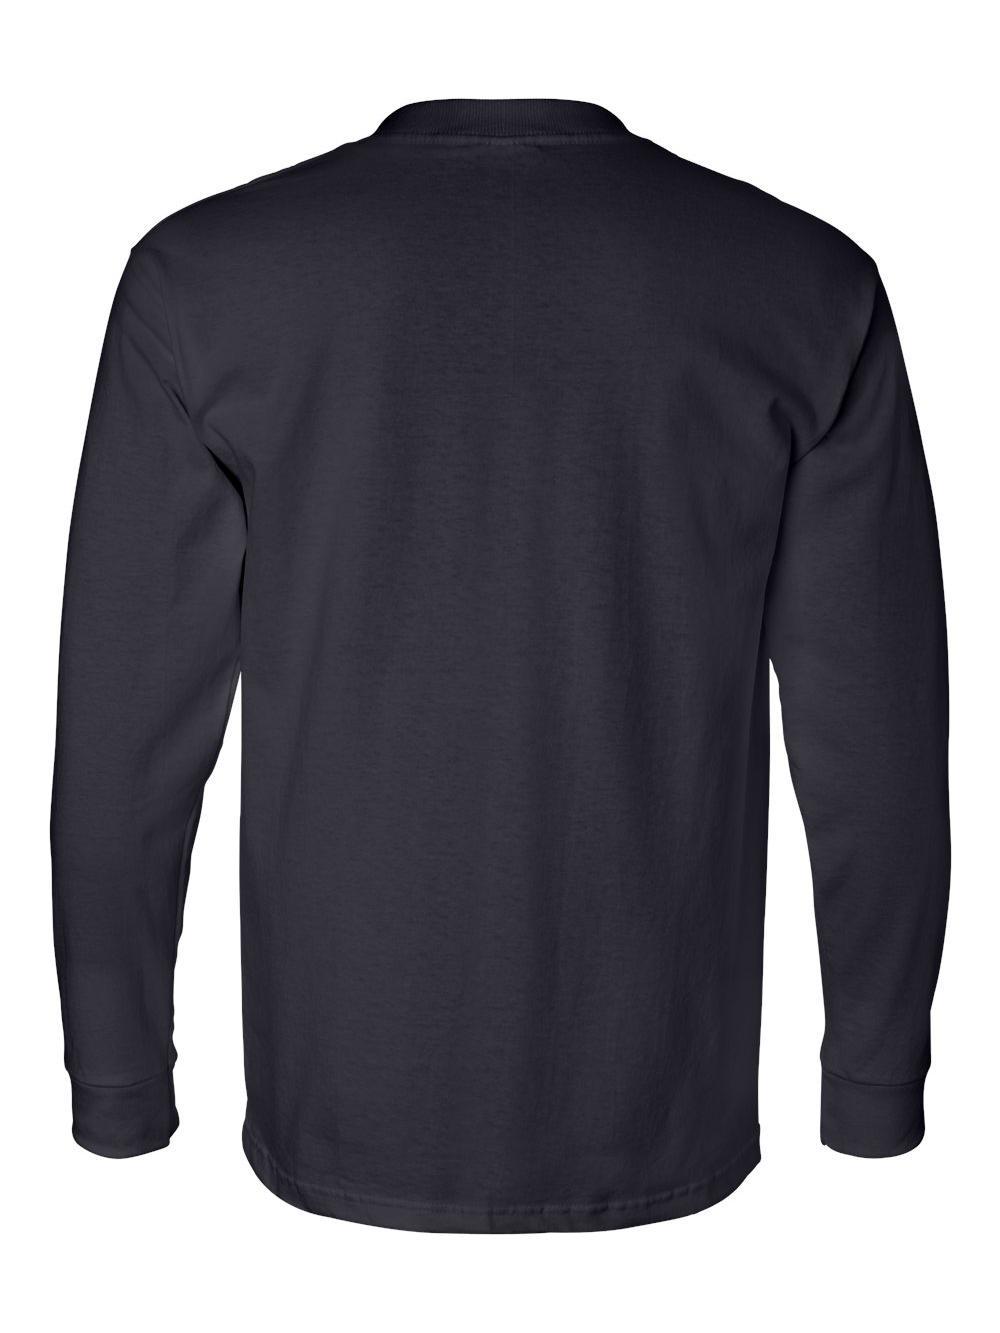 Bayside-USA-Made-Long-Sleeve-T-Shirt-with-a-Pocket-8100 thumbnail 16